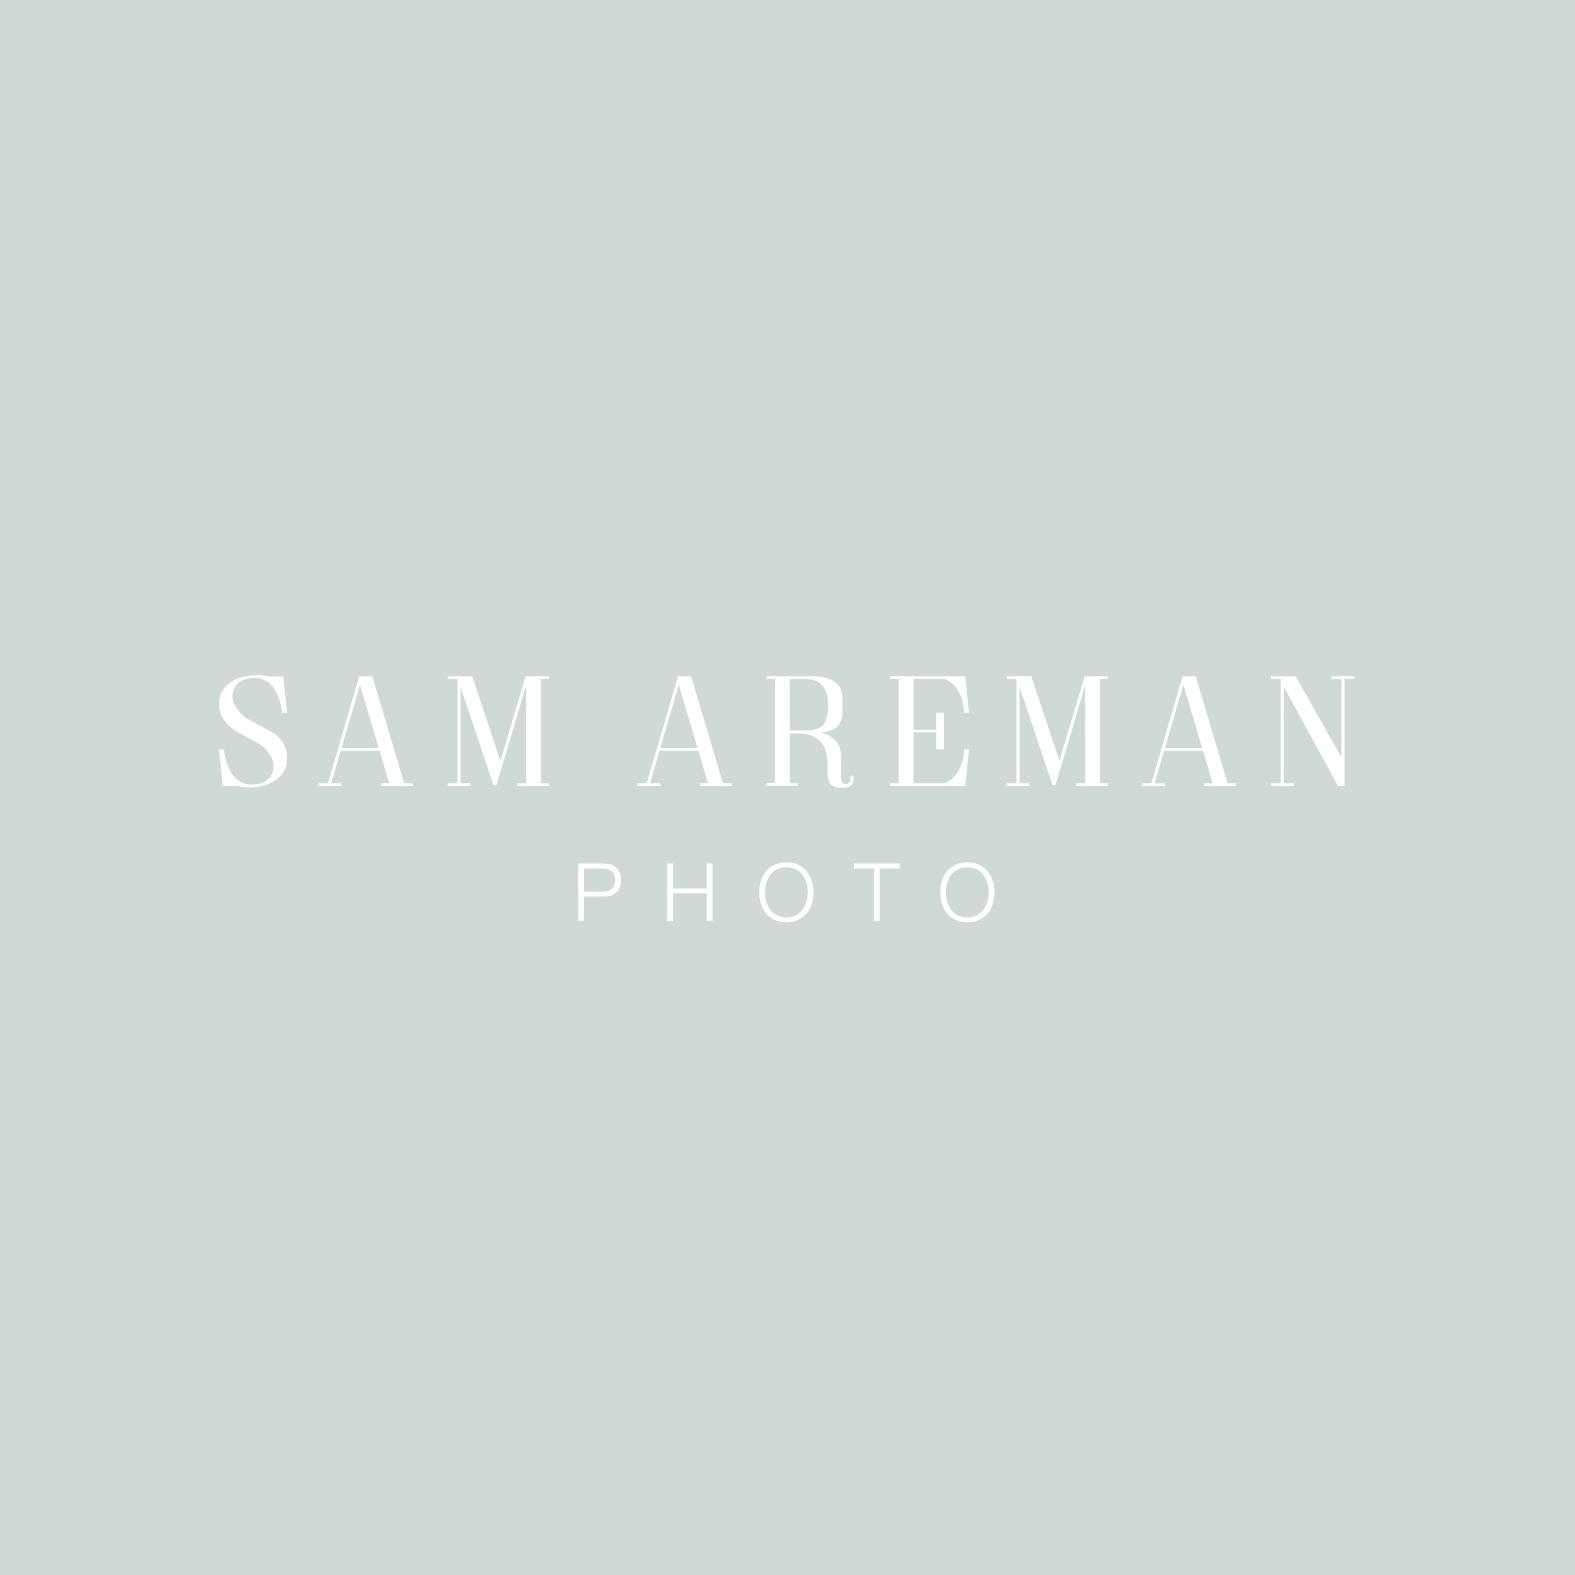 Sam Areman Photography - Lincoln / Surrounding Areas     Sam Areman